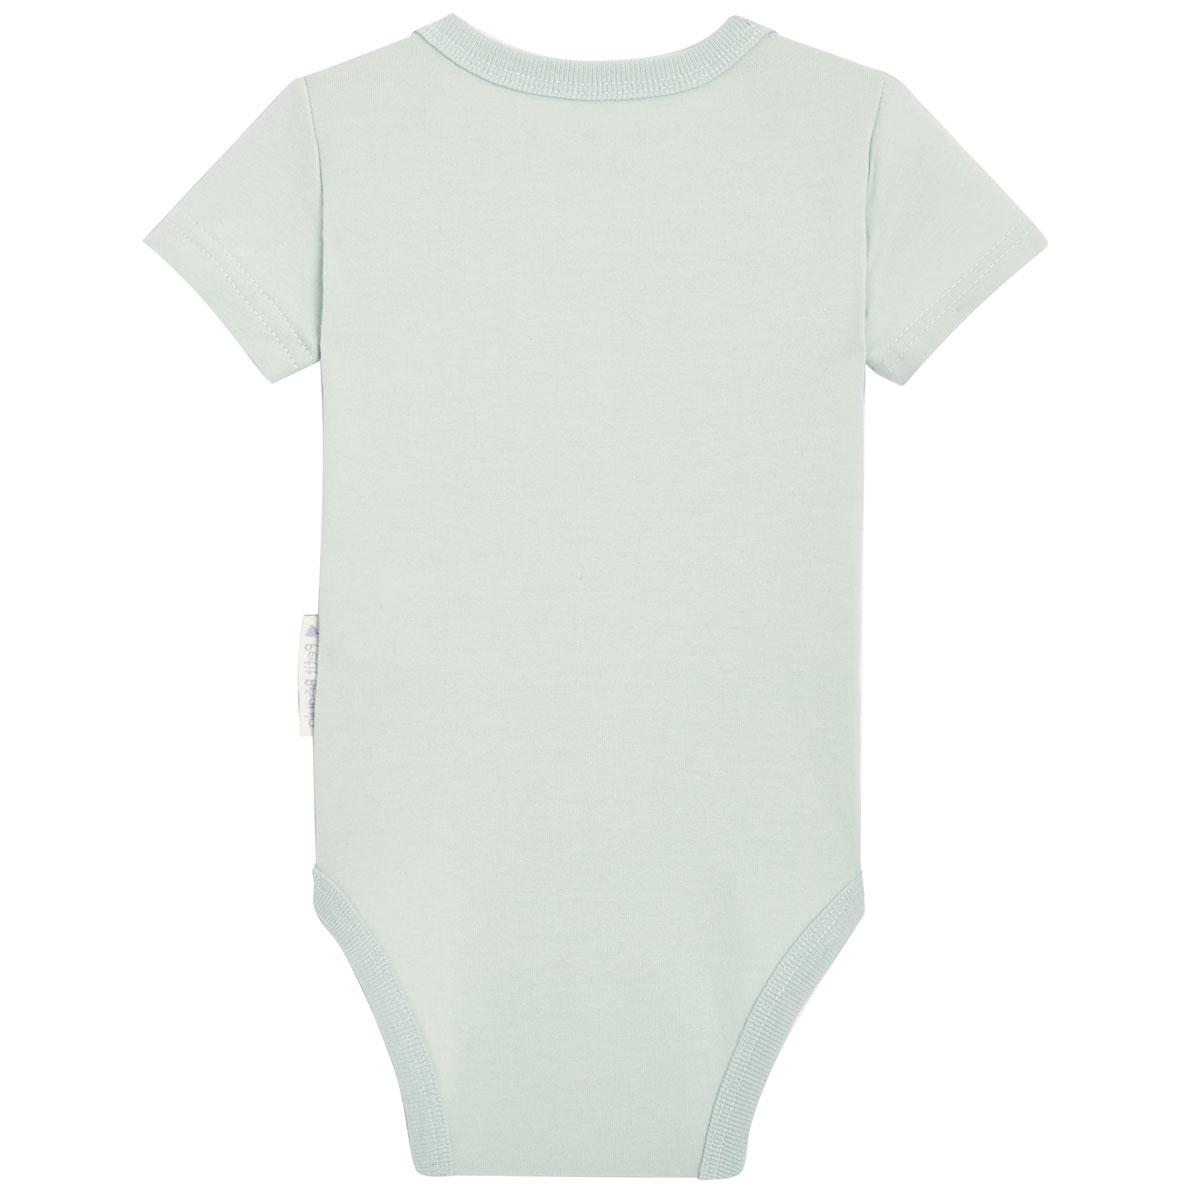 Lot de 2 bodies bébé garçon manches courtes contenant du coton bio Dinokoko 1 dos